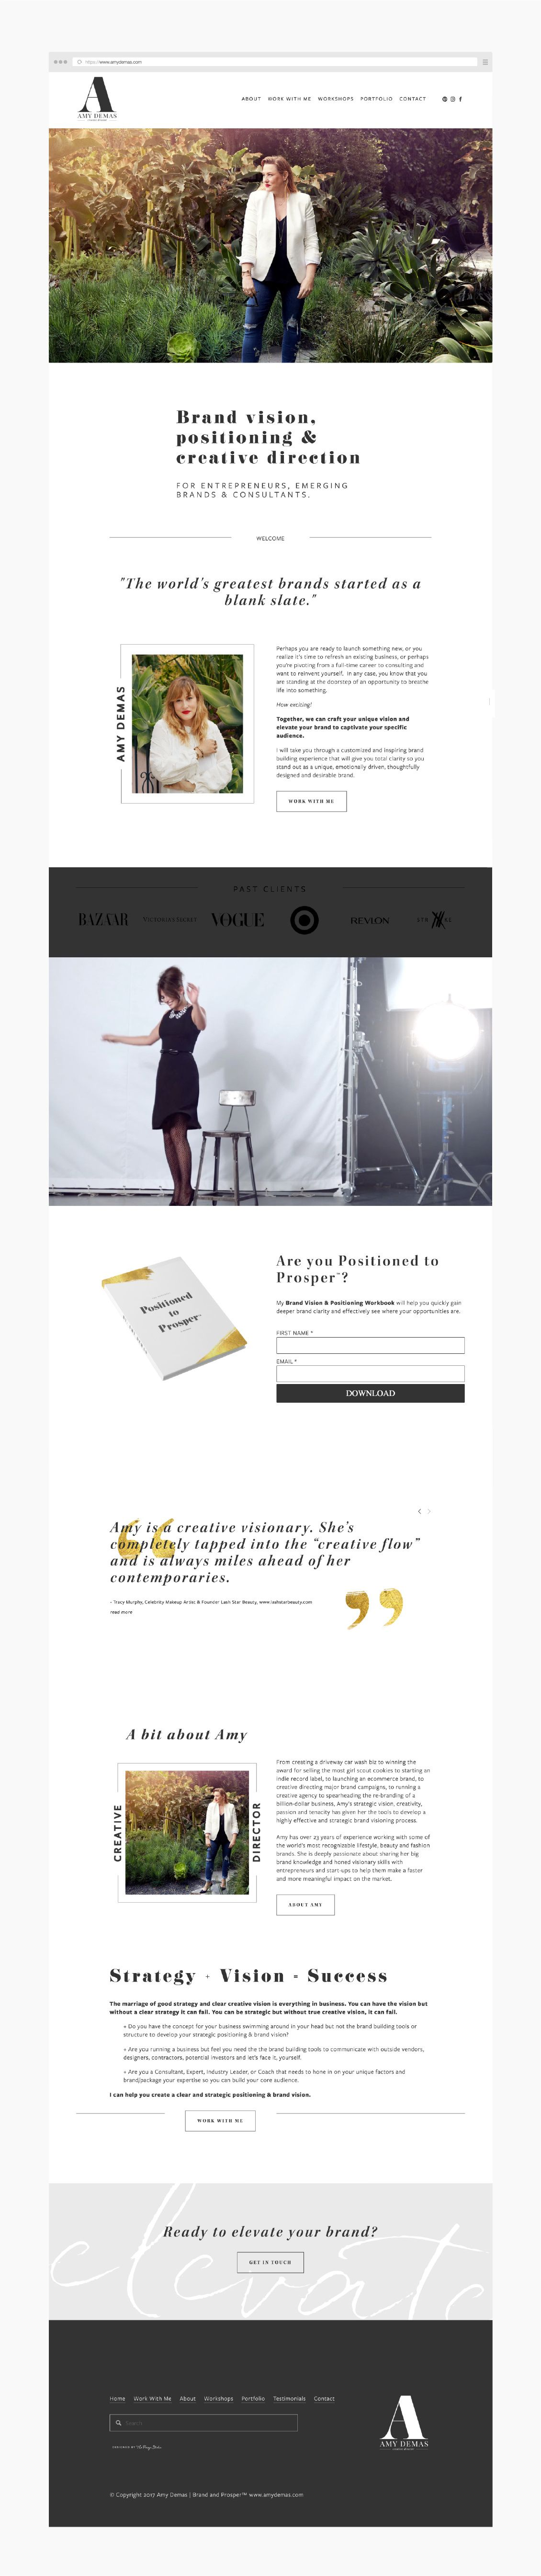 Amy Demas Website Design Paige Brunton Squarespace Templates Squarespace Designer Courses Website Design Blog Website Design Diy Website Design